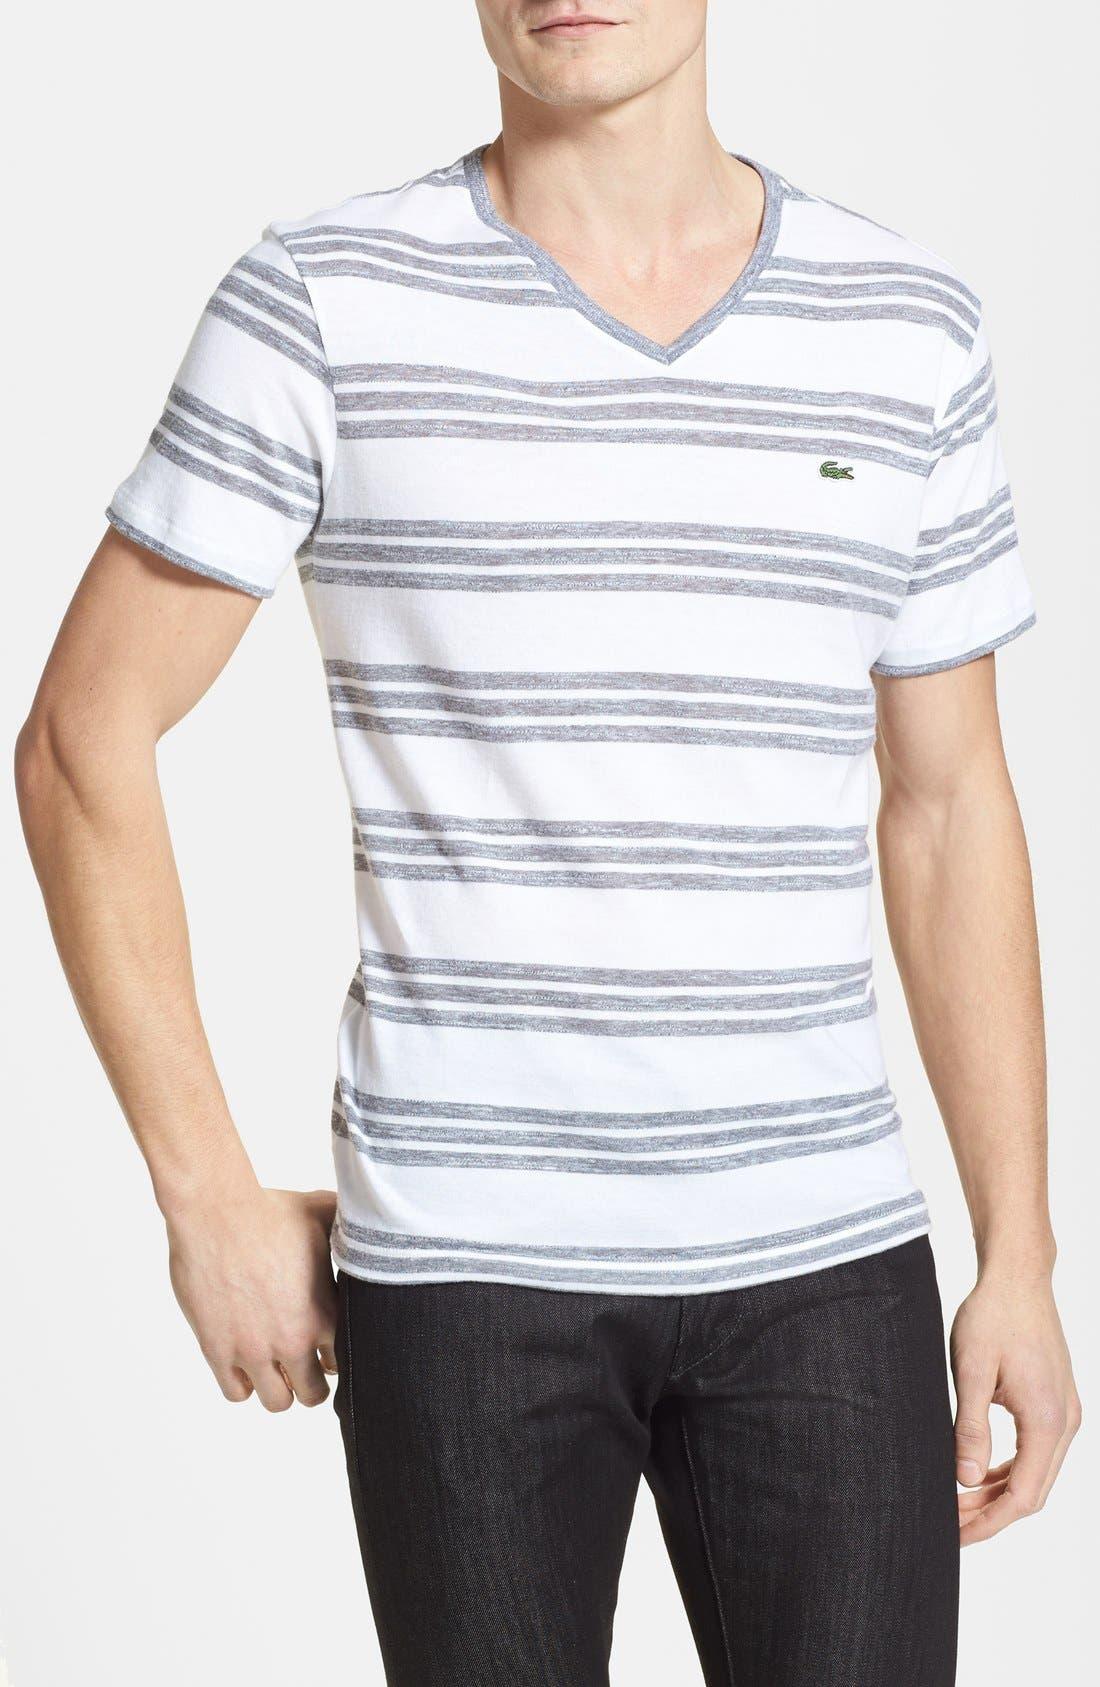 Alternate Image 1 Selected - Lacoste Jaspe Stripe Jersey V-Neck T-Shirt